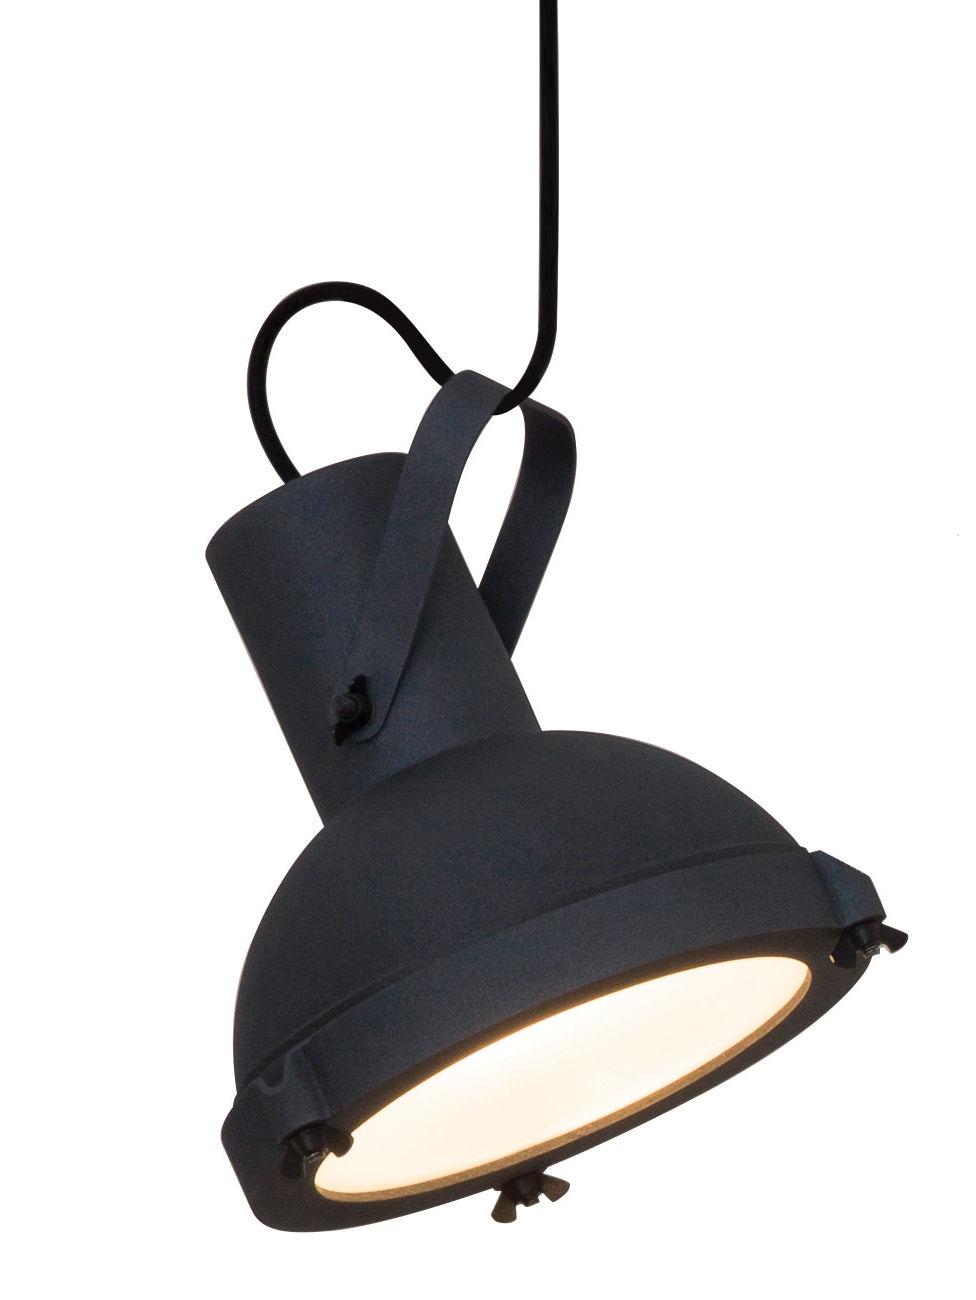 Leuchten - Pendelleuchten - Projecteur 165 Pendelleuchte von Le Corbusier - Neuauflage des Originals von 1954 - Nemo - Dunkelblau-anthrazit - bemaltes Aluminium, Opalglas